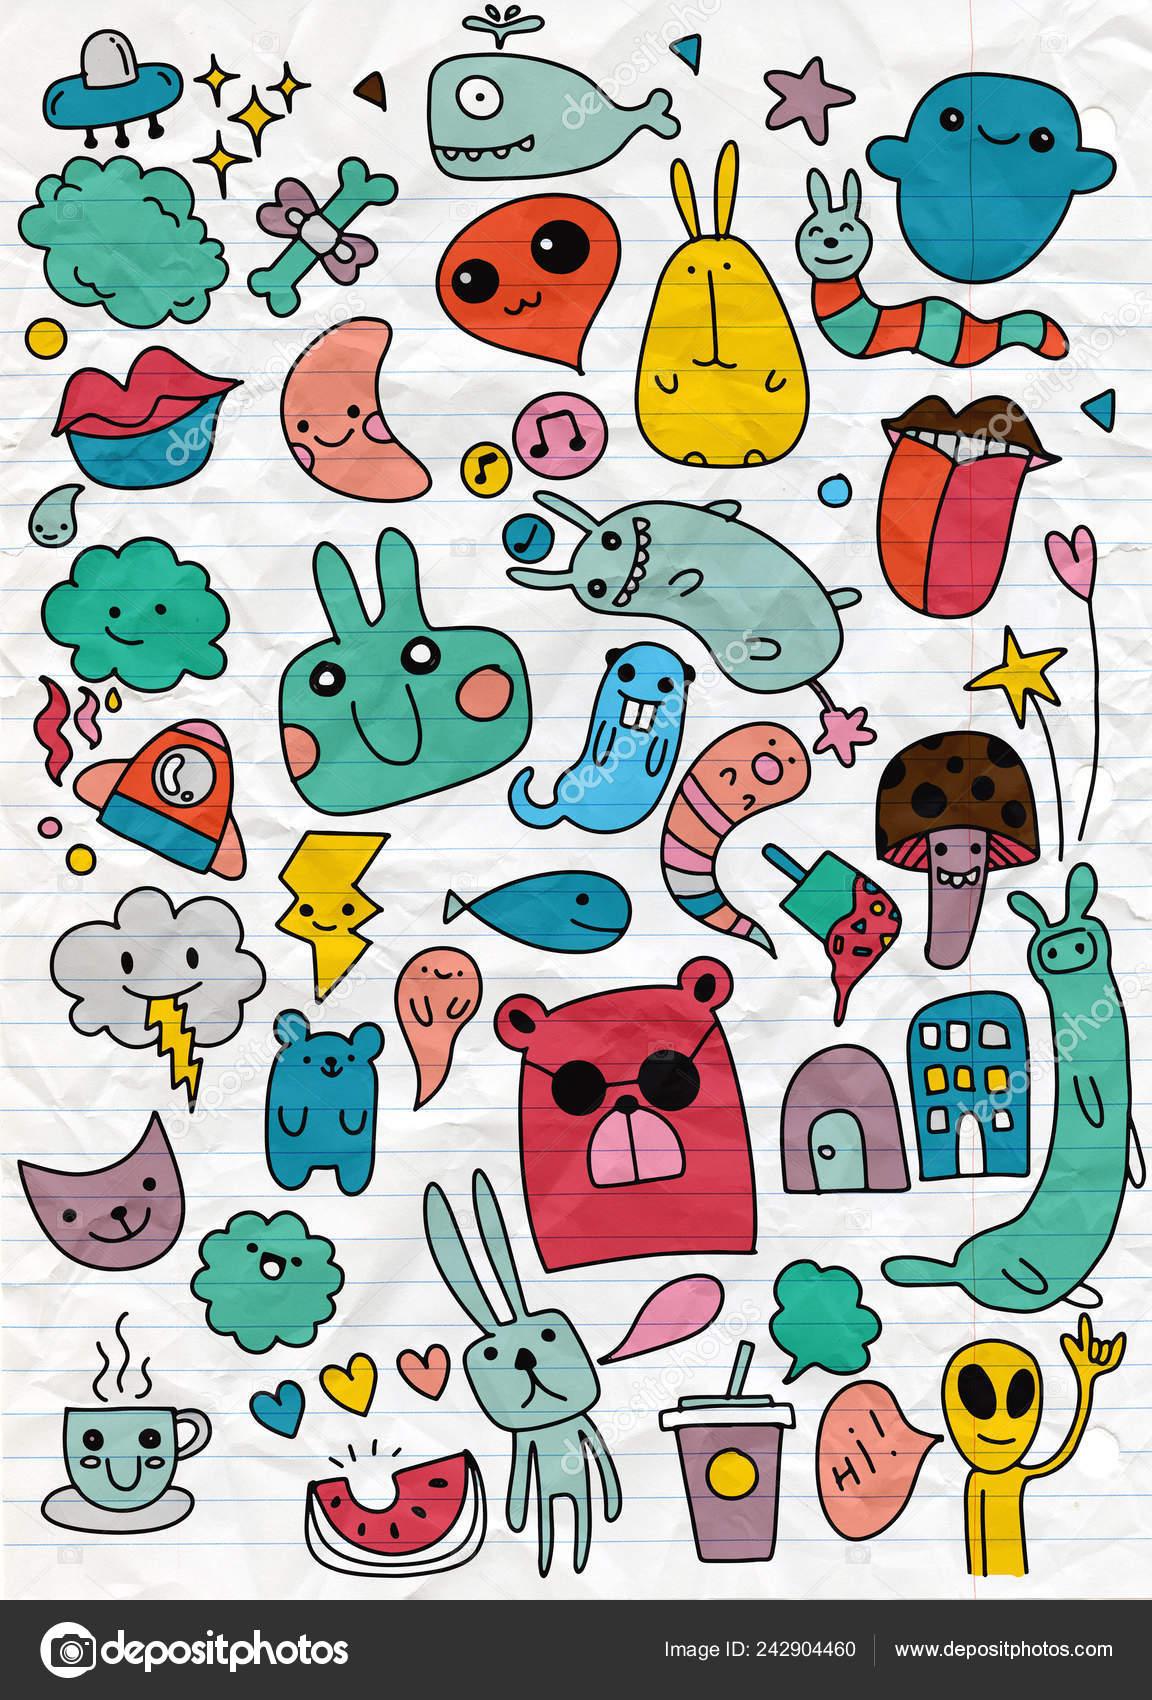 Rucne Kreslene Vektorove Ilustrace Doodle Kawaii Illustrator Line